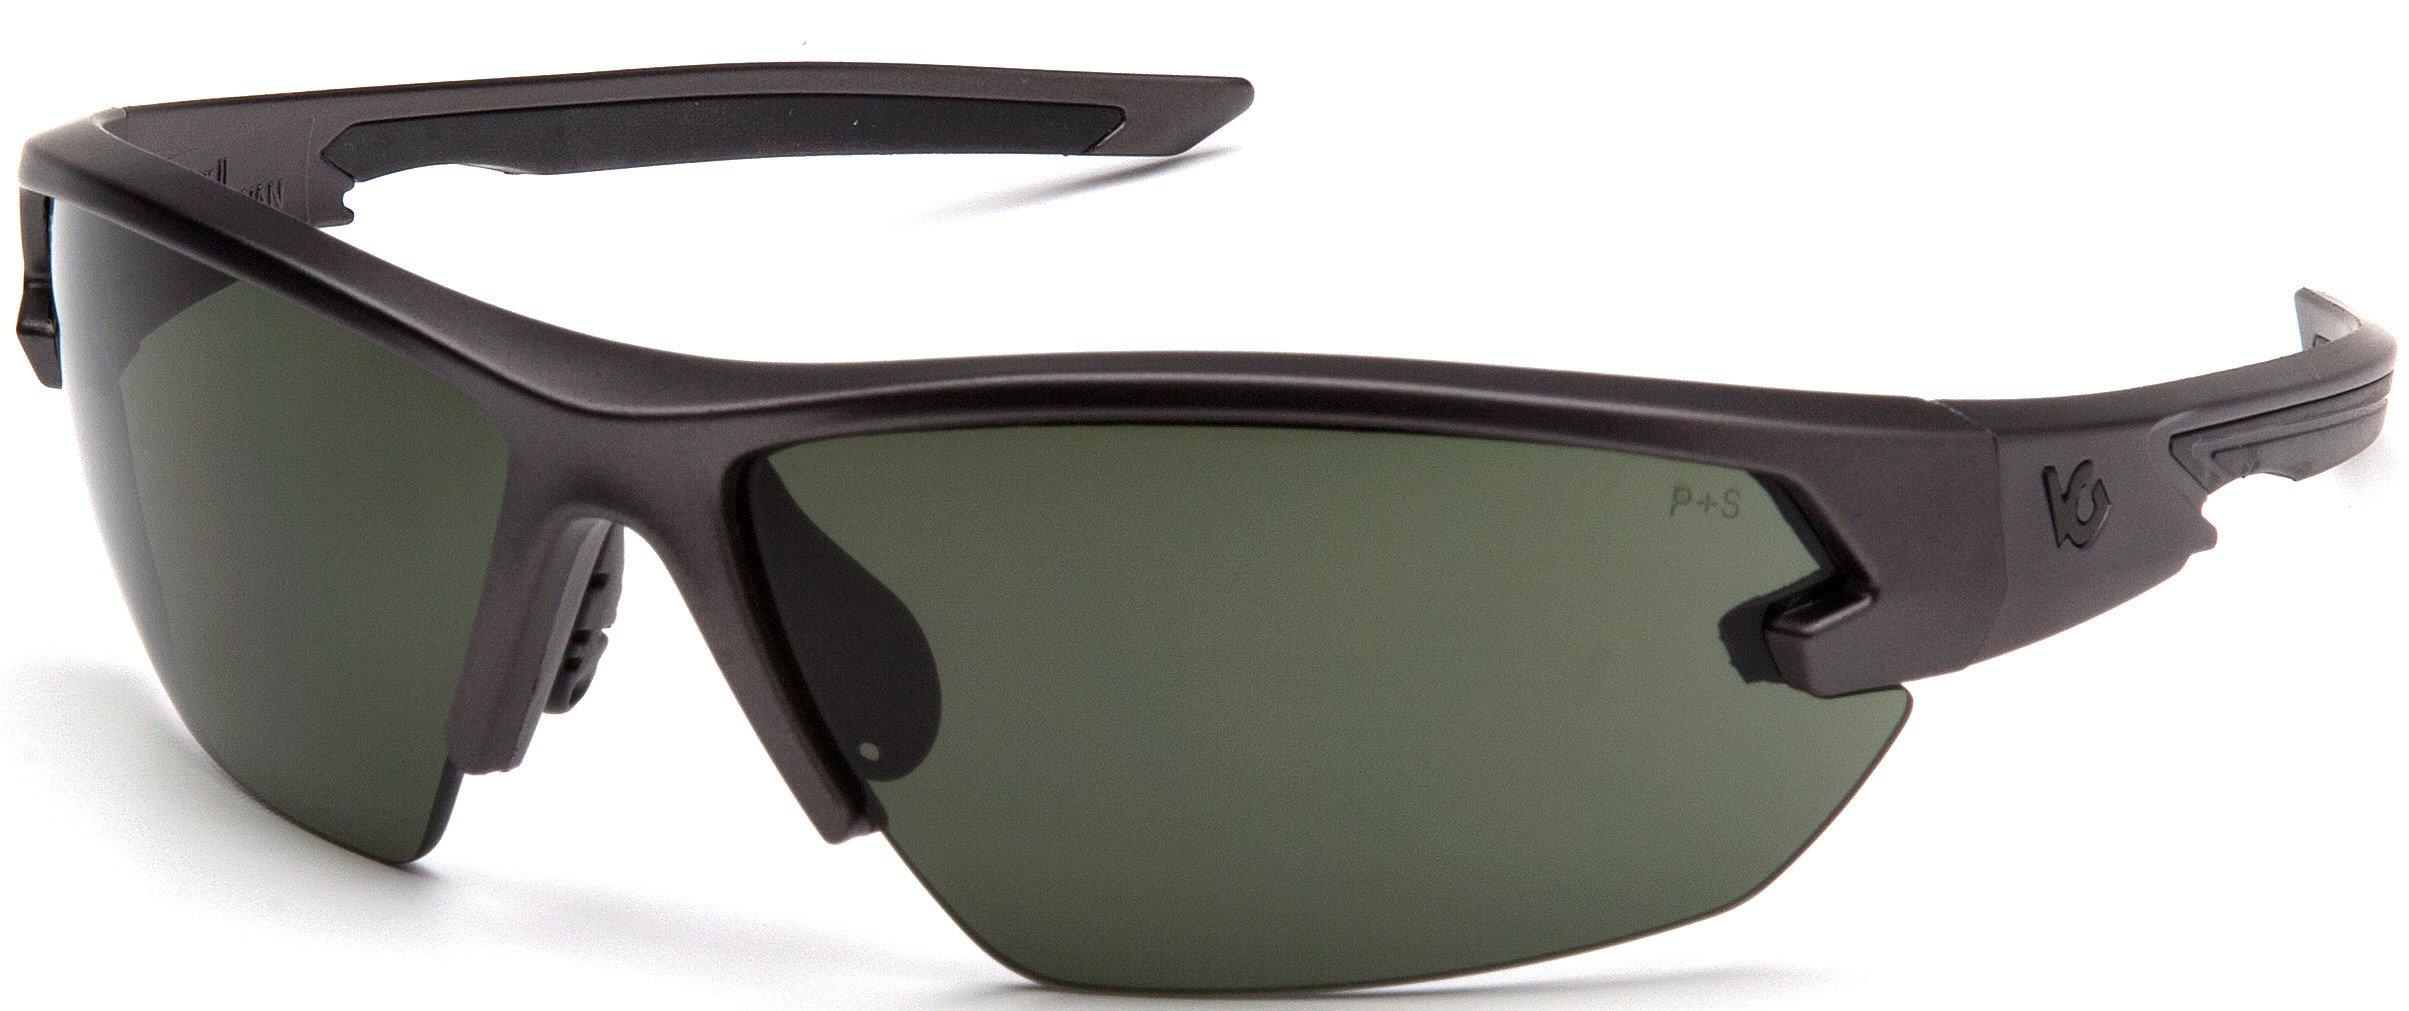 Venture Gear Tactical Semtex 2.0 Safety Shooting Glasses, Gun Metal Frame, Forest Gray Anti-Fog Lens